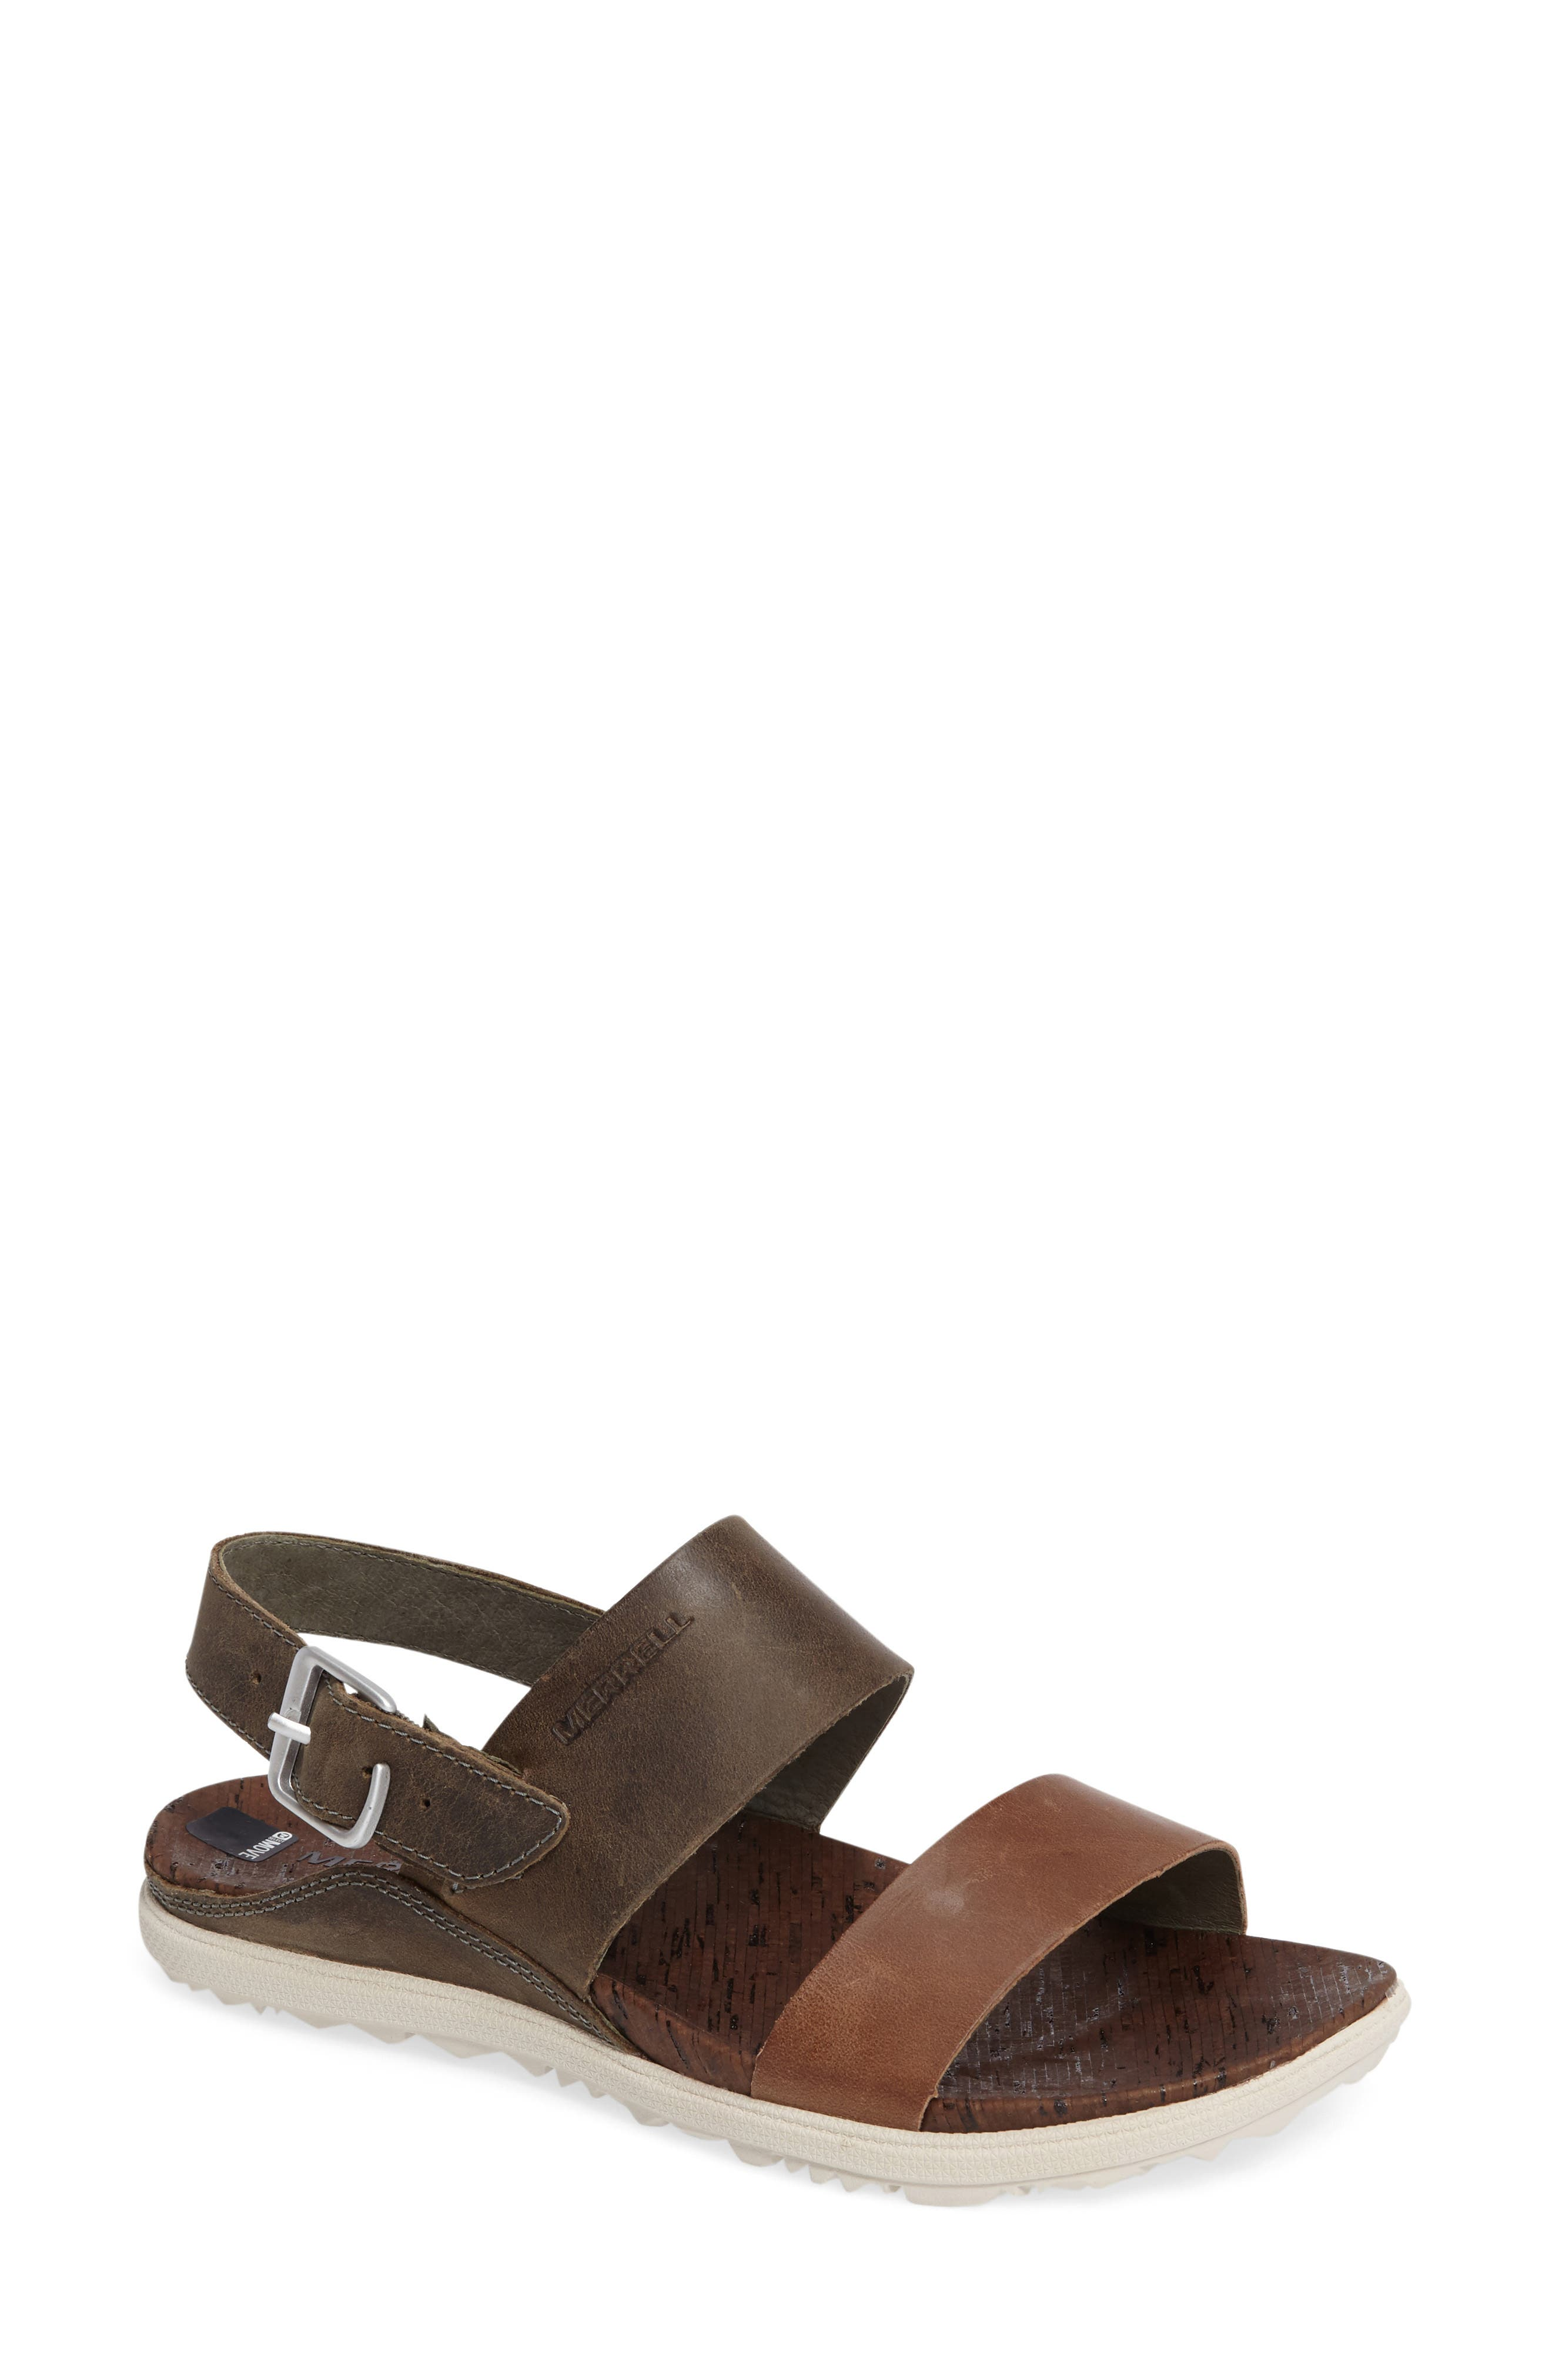 'Around Town' Slingback Sandal